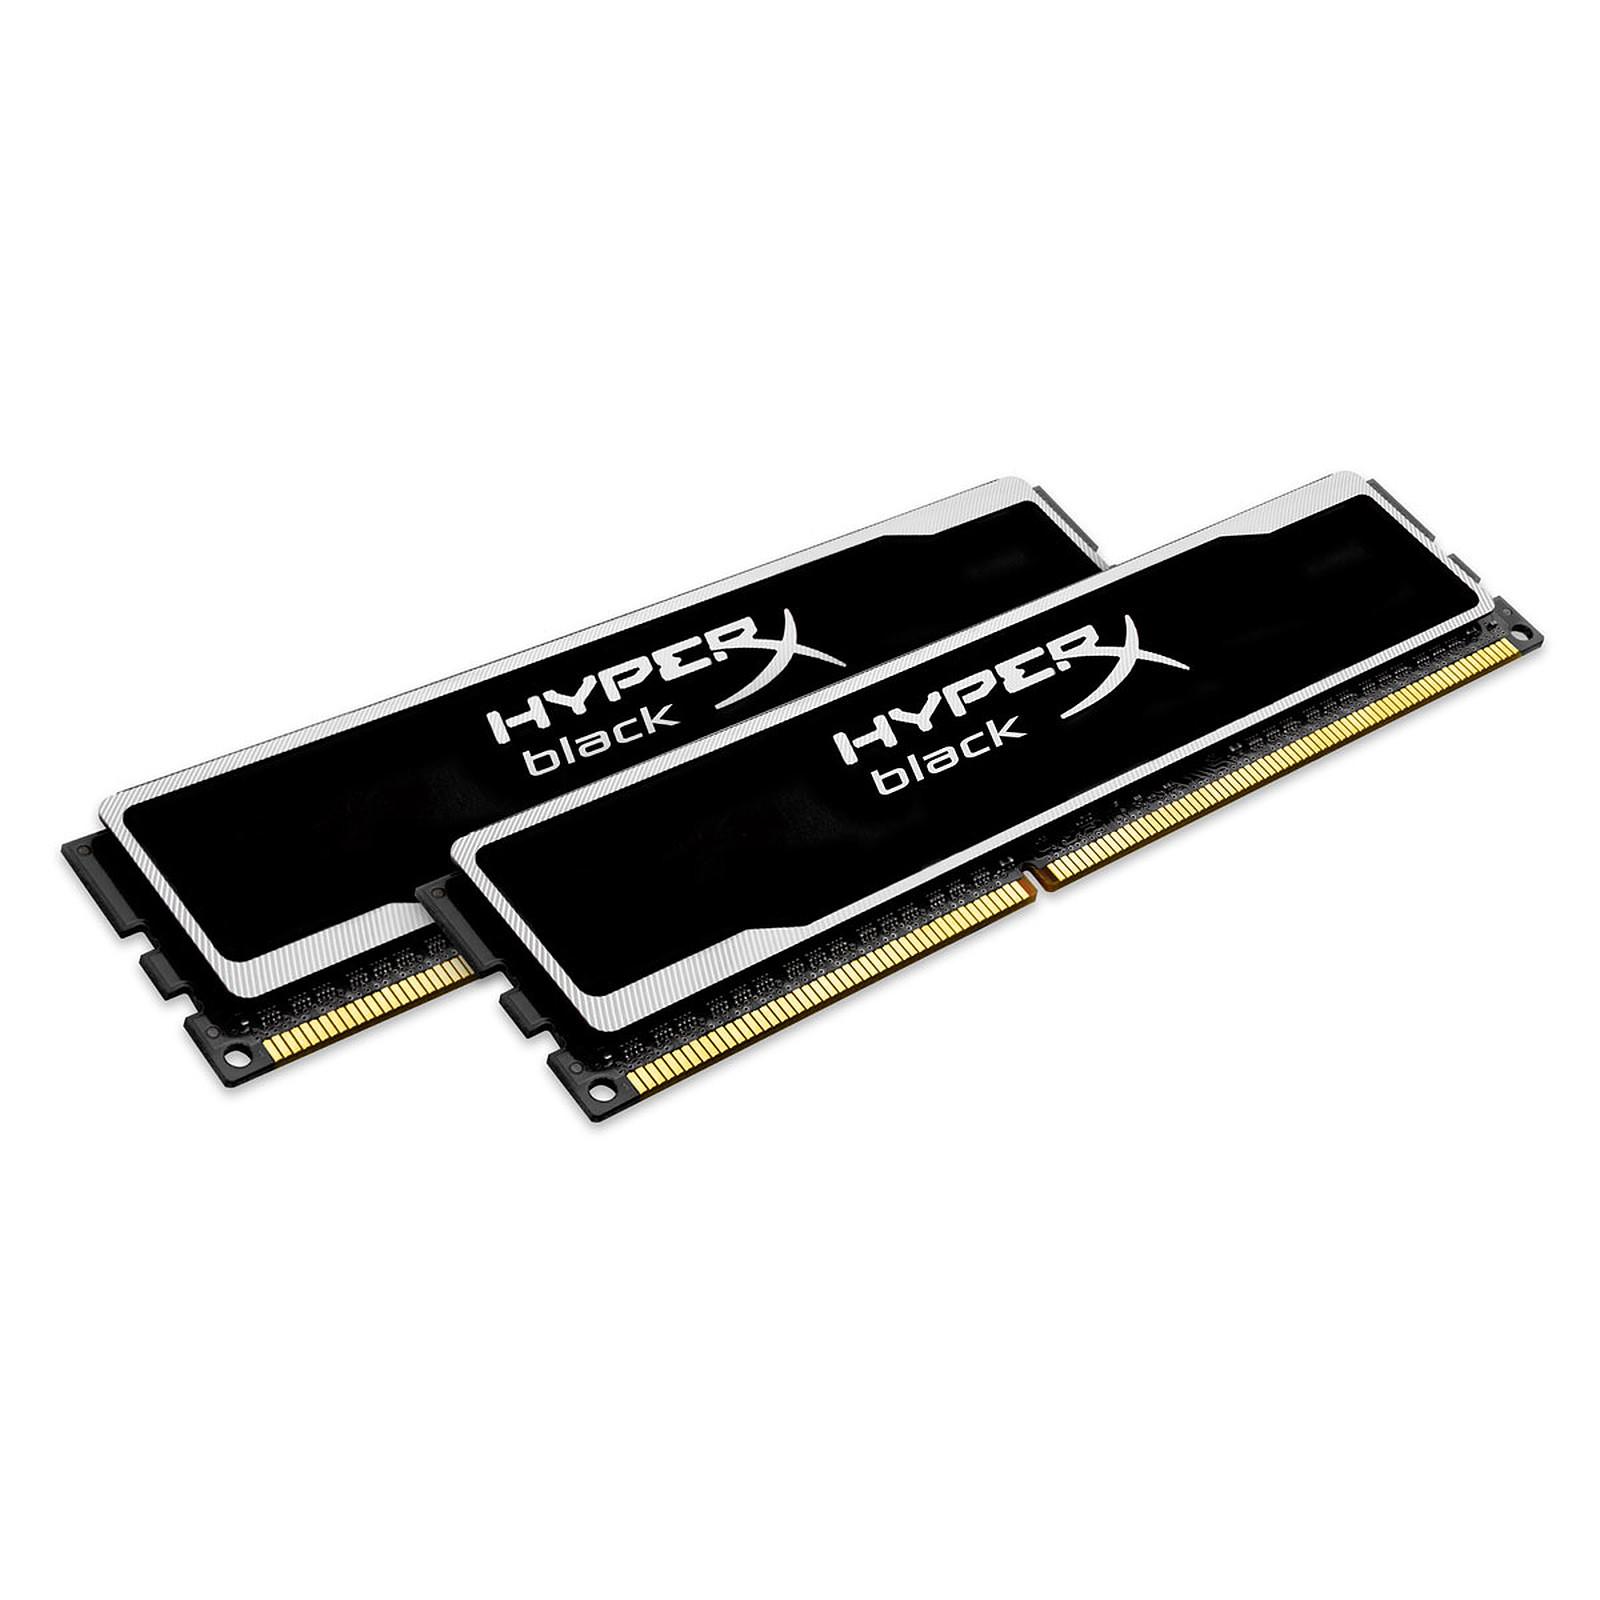 Kingston HyperX black 8 Go (2x 4Go) DDR3 1333 MHz CL9